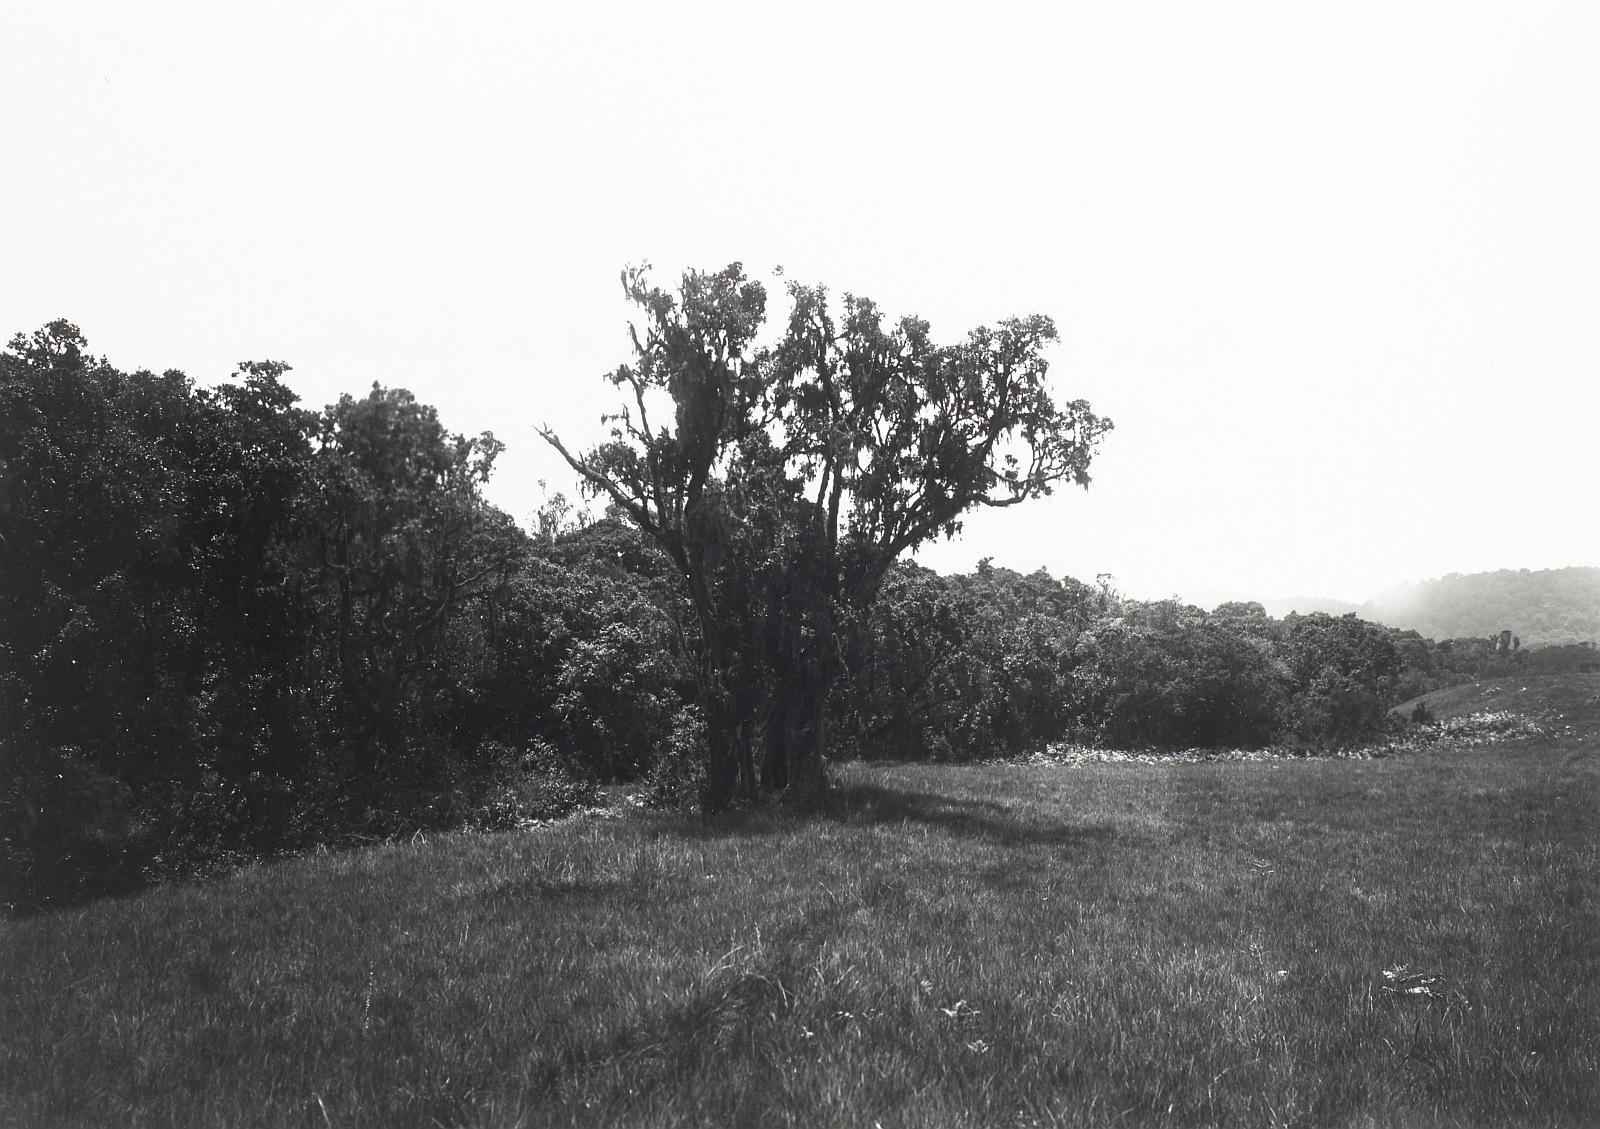 16. Килиманджаро. Горомбо, верхняя граница леса